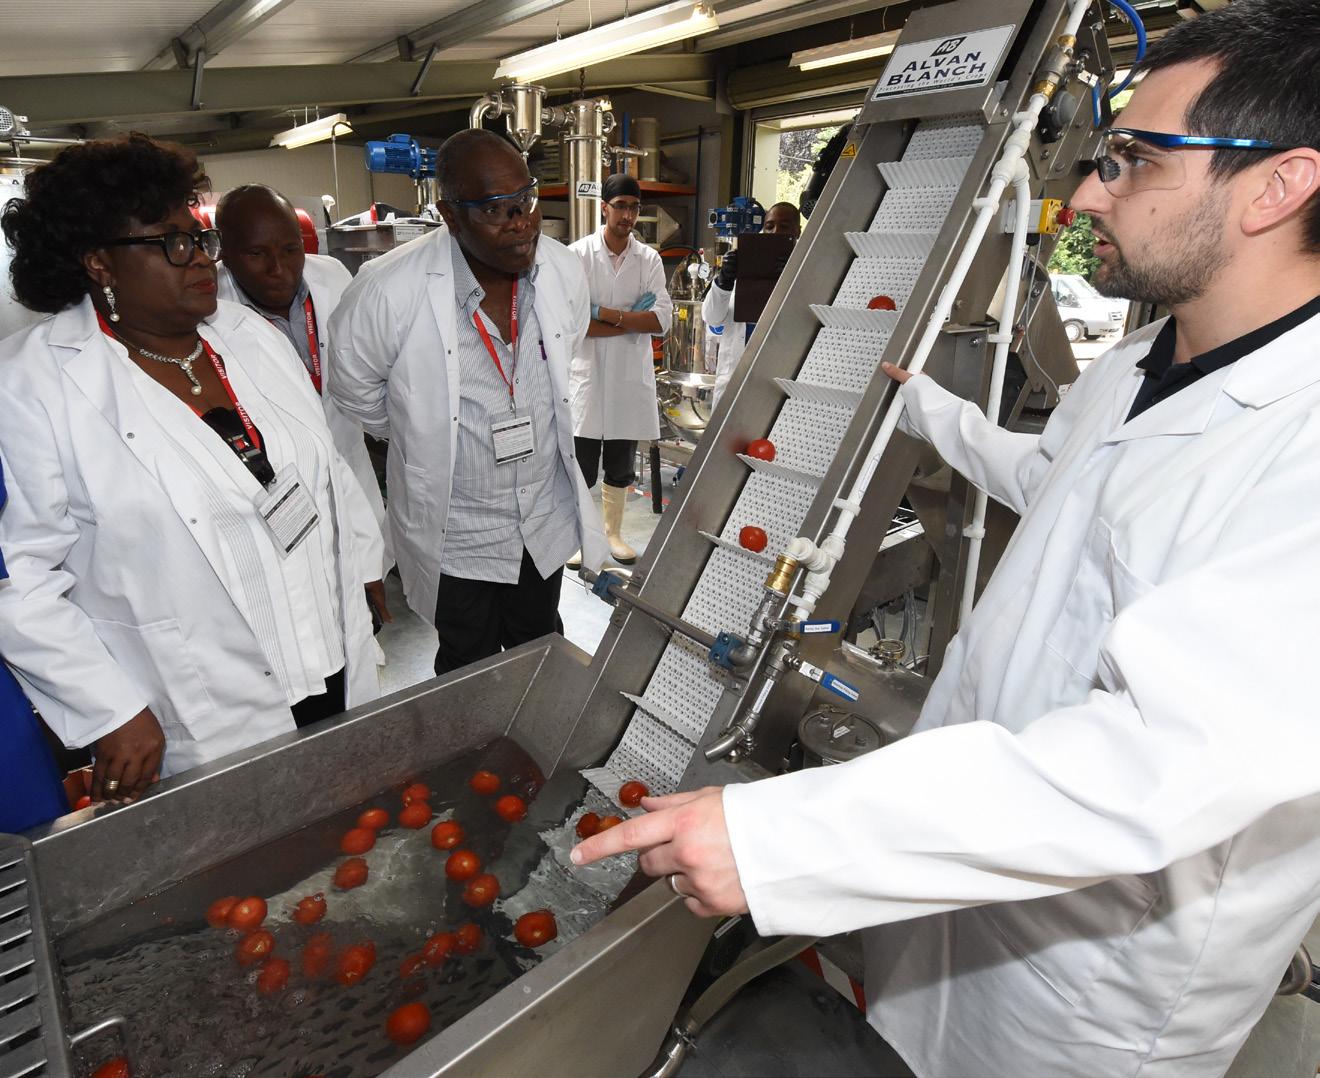 Alvan Blanch Tomato Paste Processing System Nigeria Page 1 Image 0001